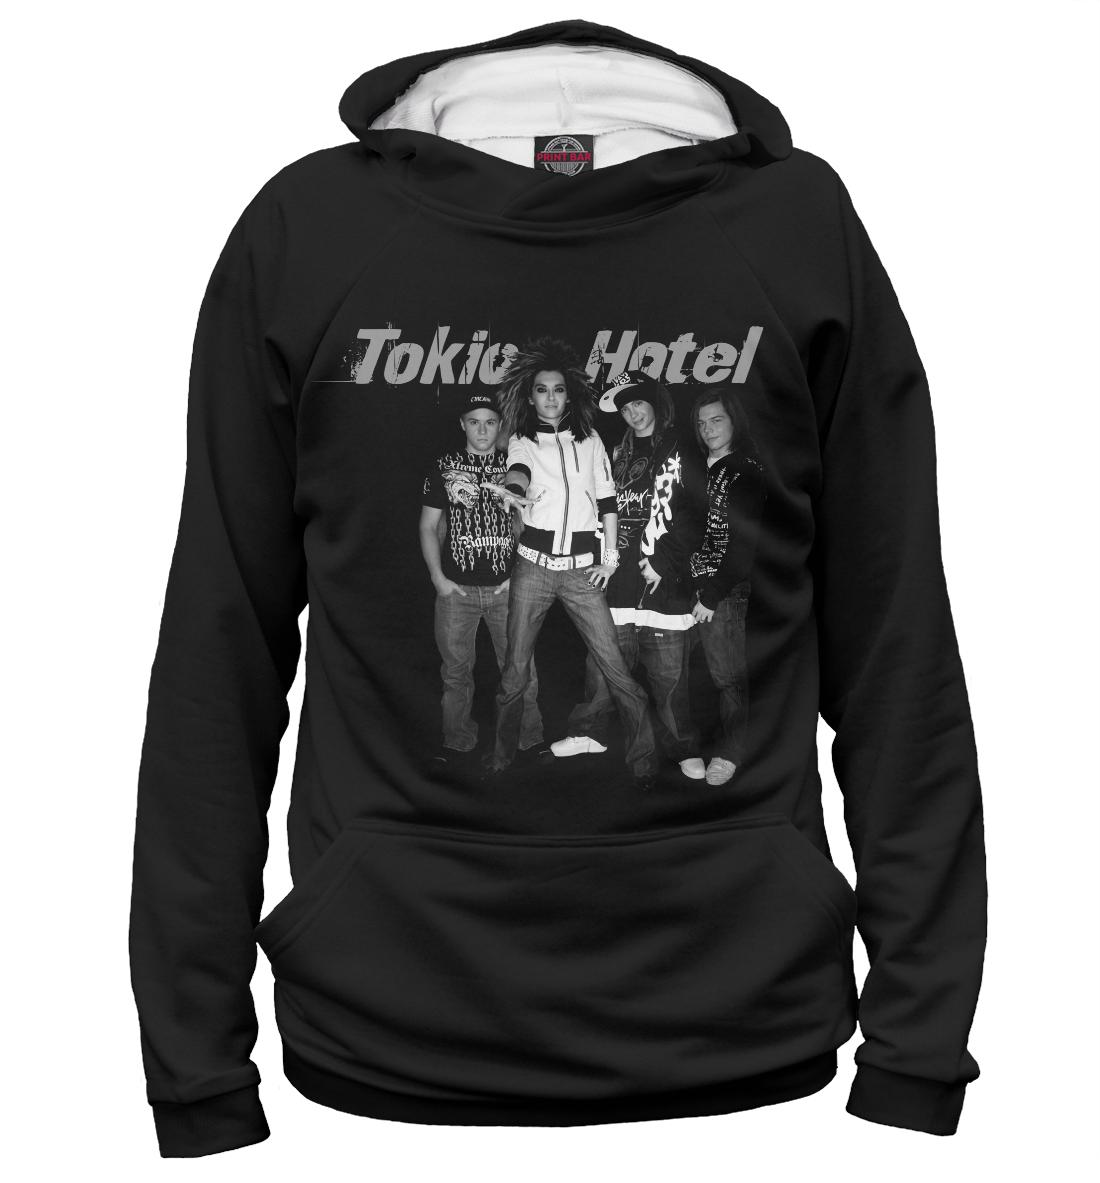 Купить Tokio Hotel, Printbar, Худи, THT-741484-hud-2